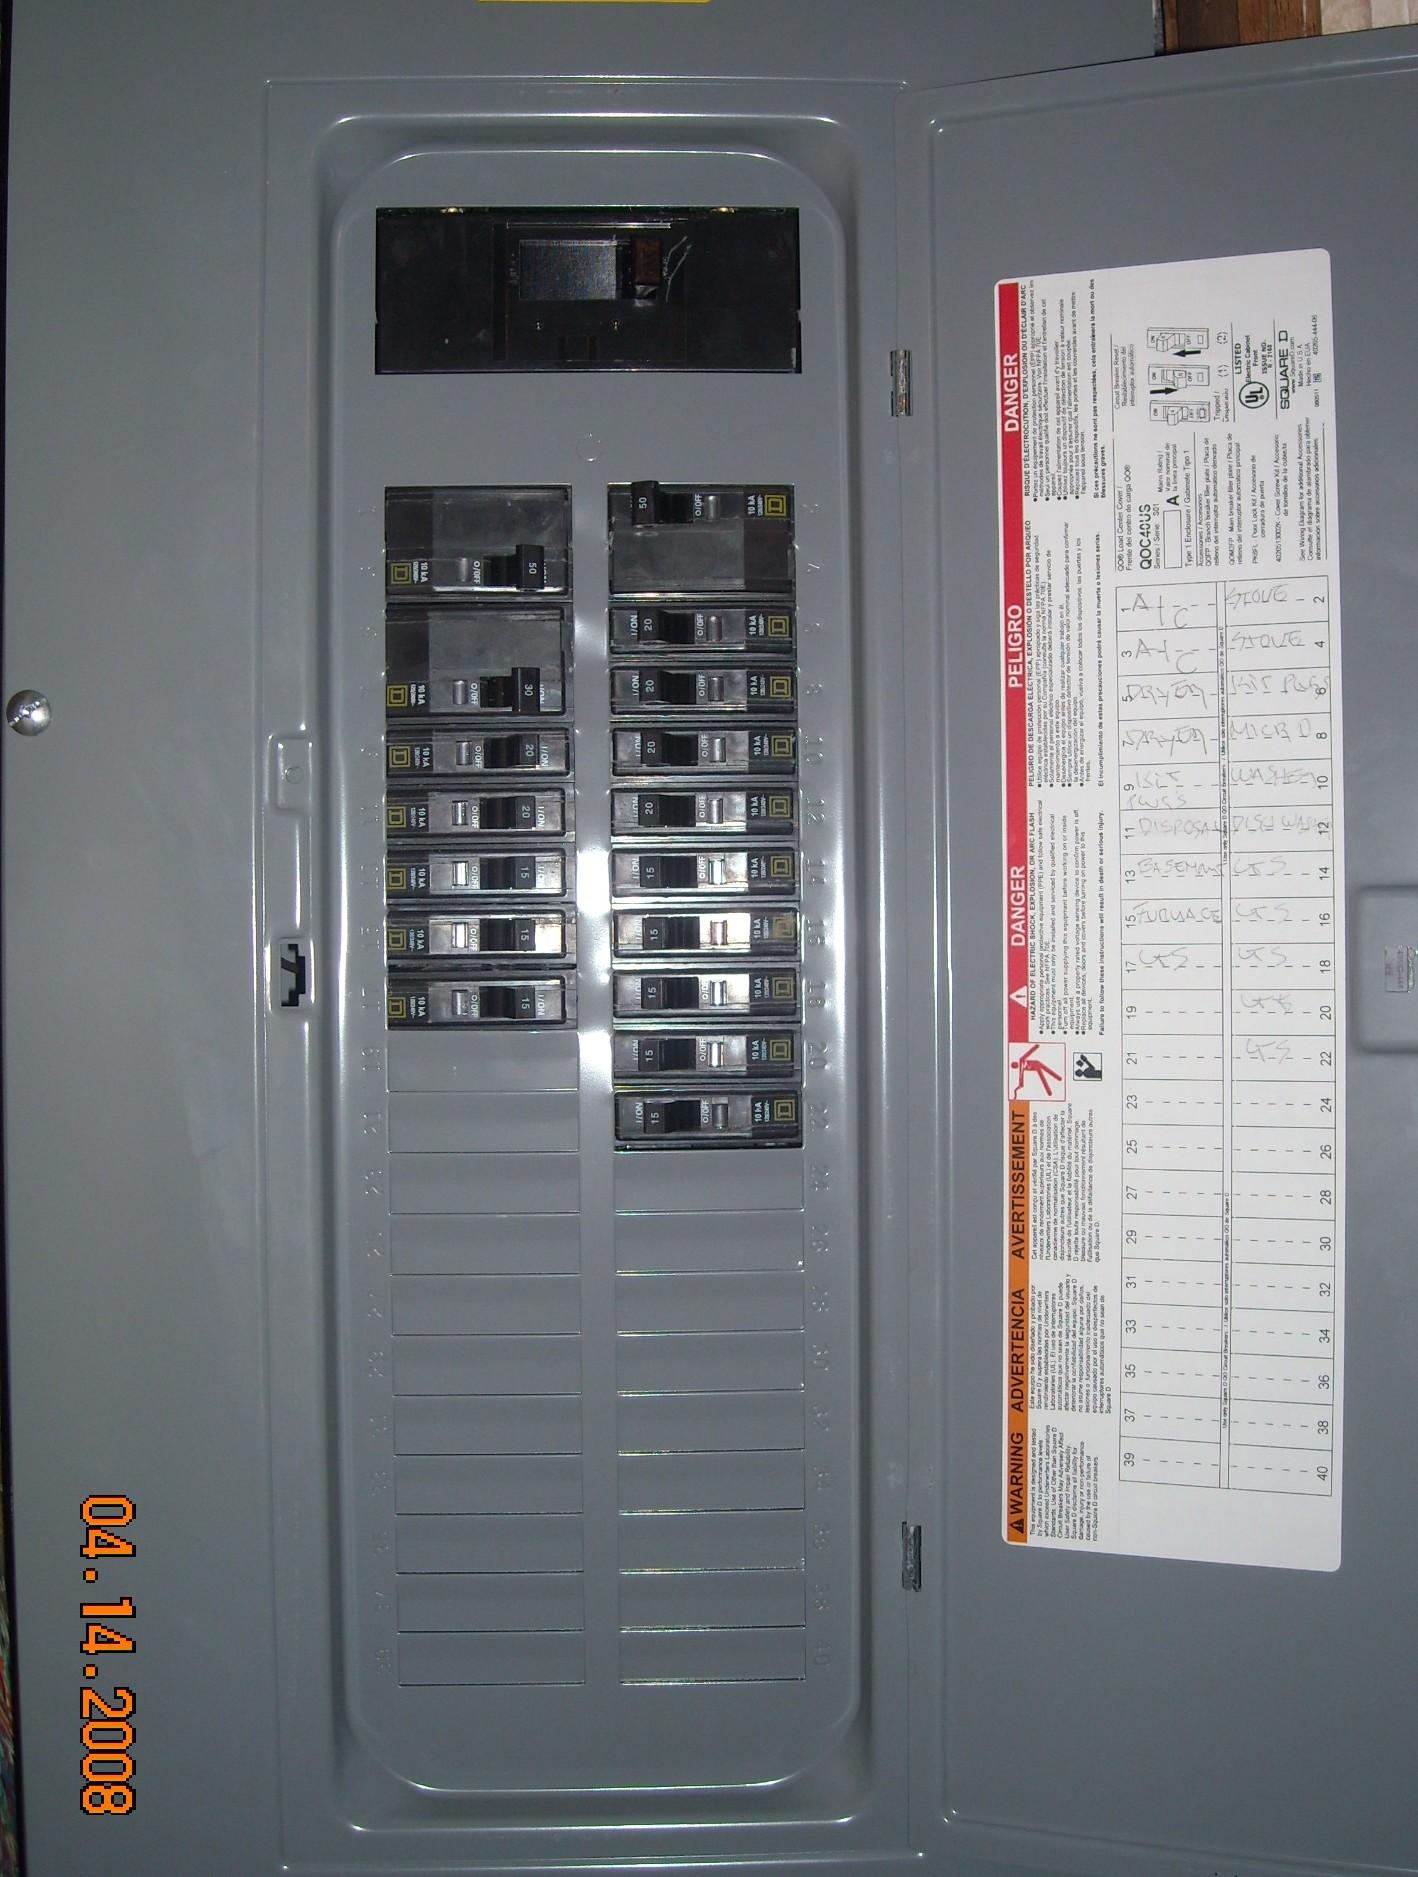 Murray Breaker Panel Wiring Diagram Auto Electrical Box